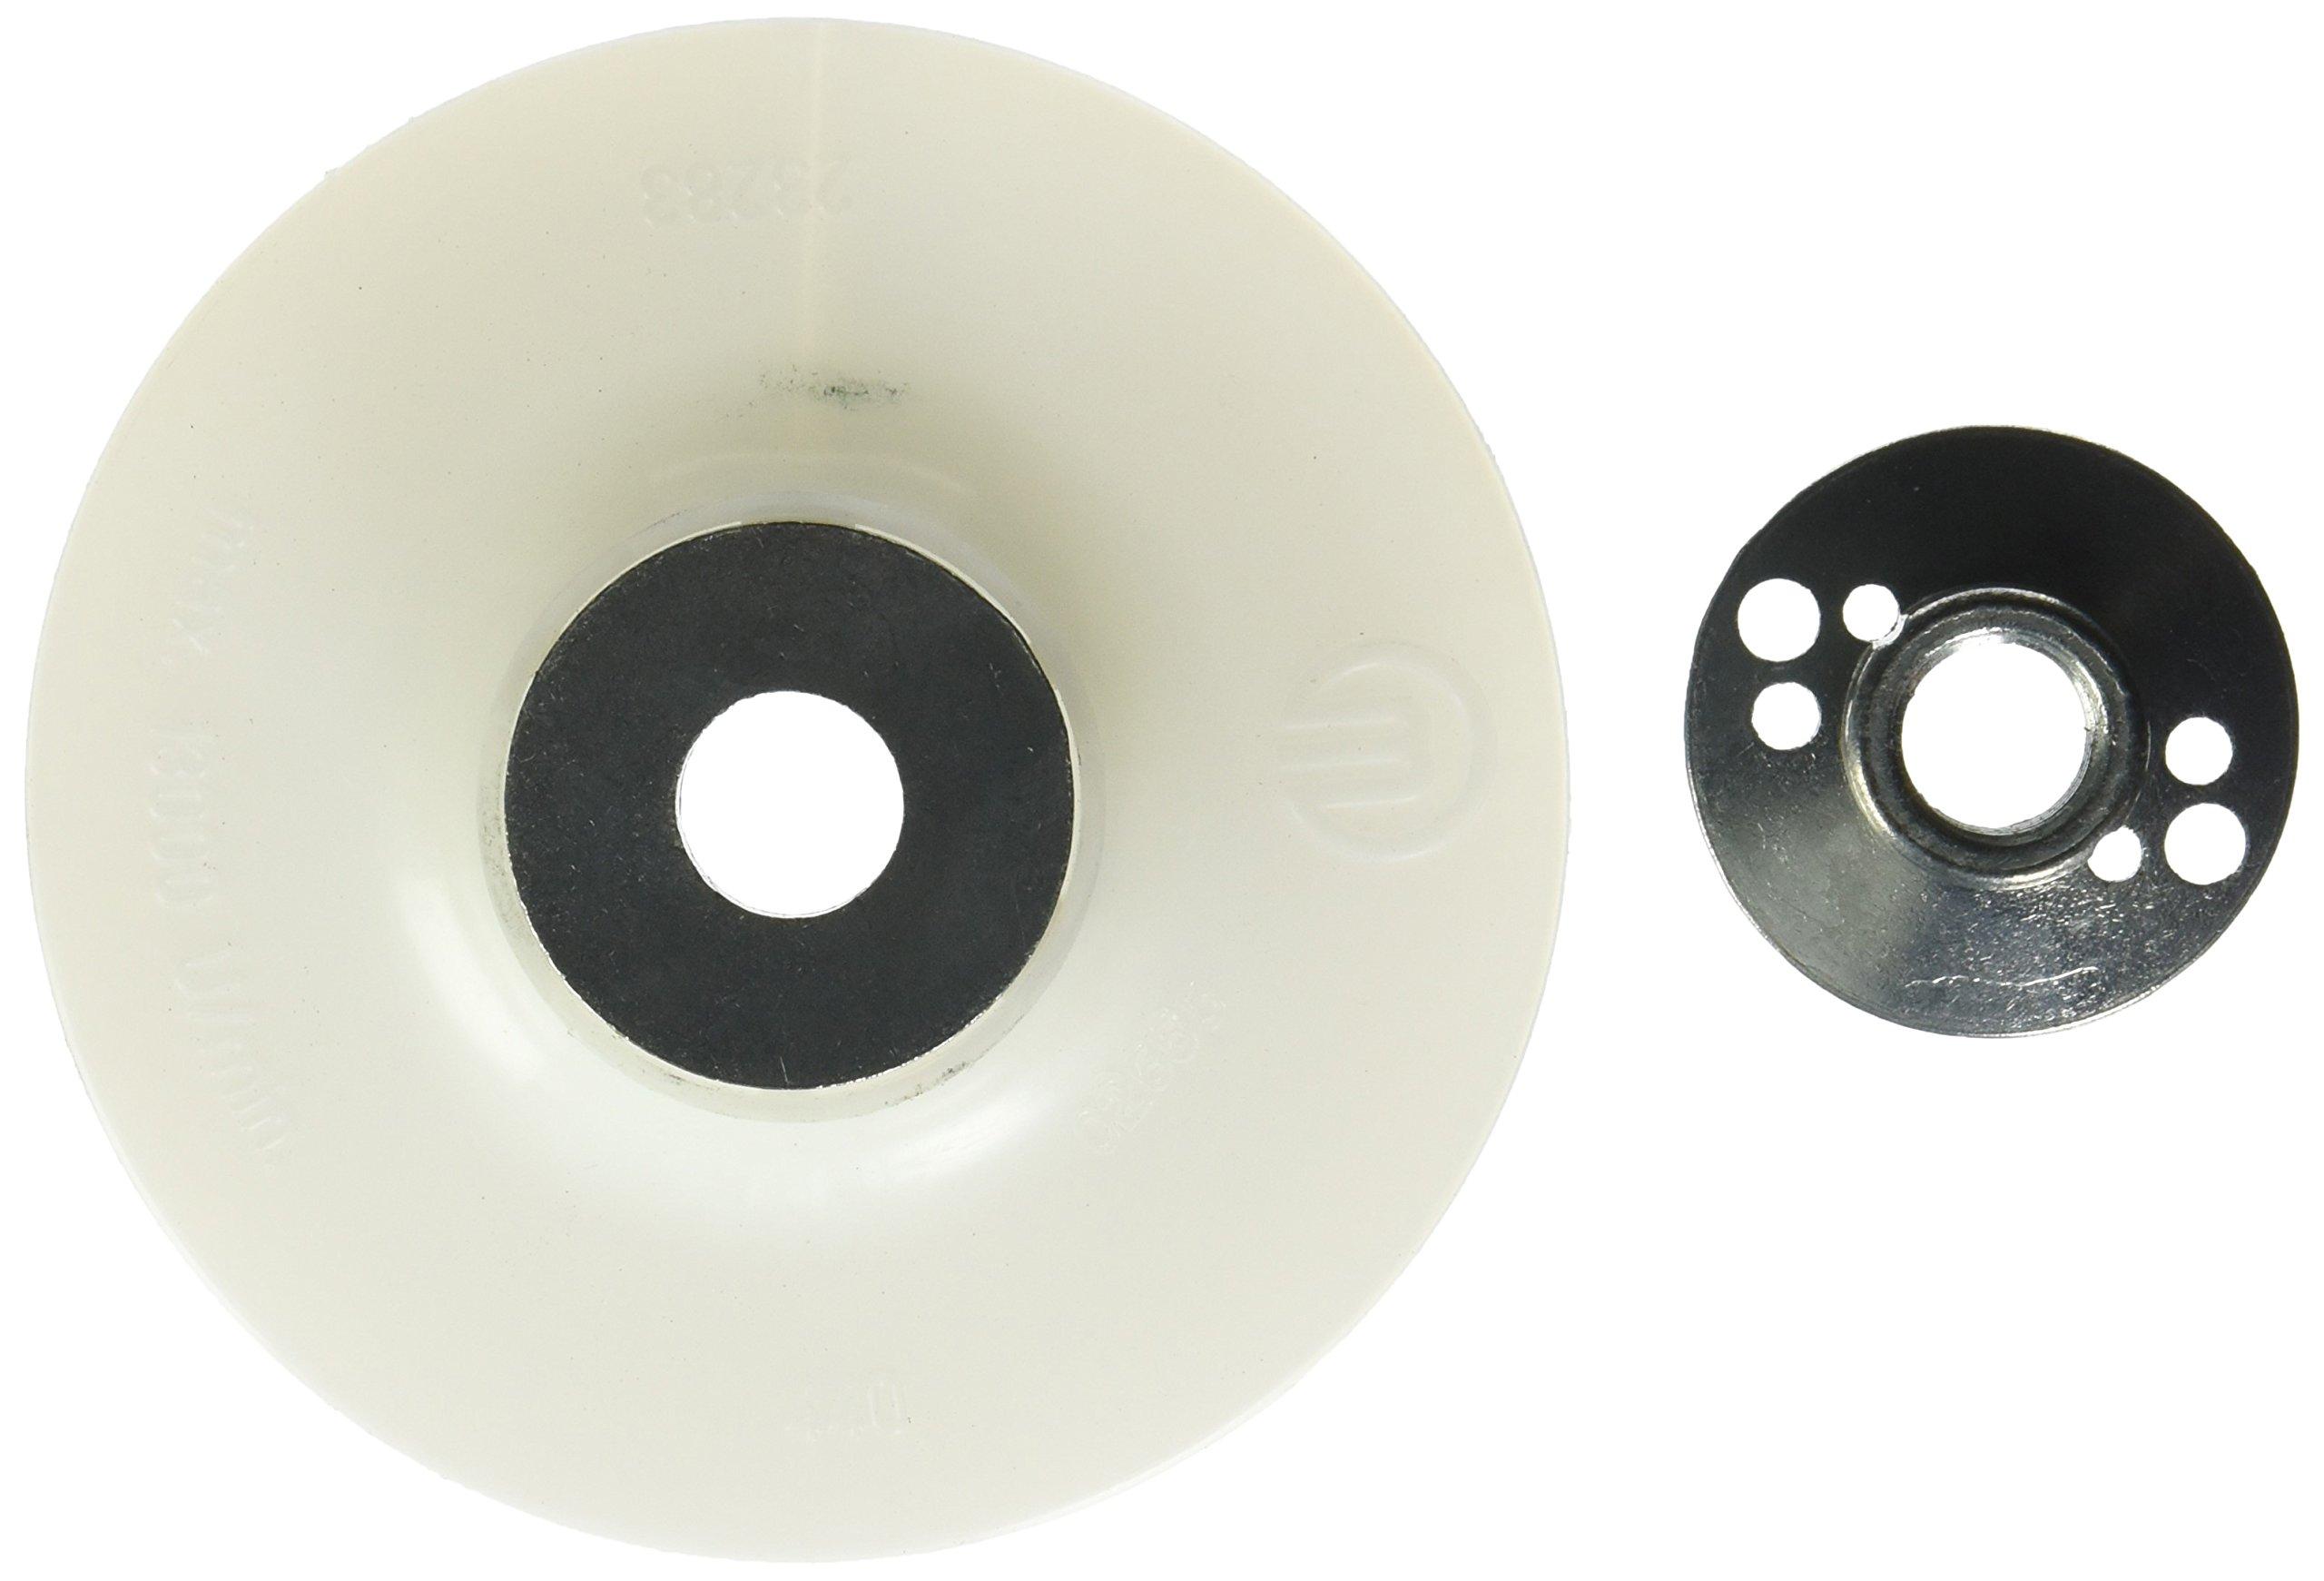 Metabo 623283000 4-1/2-Inch Backing Pad, White